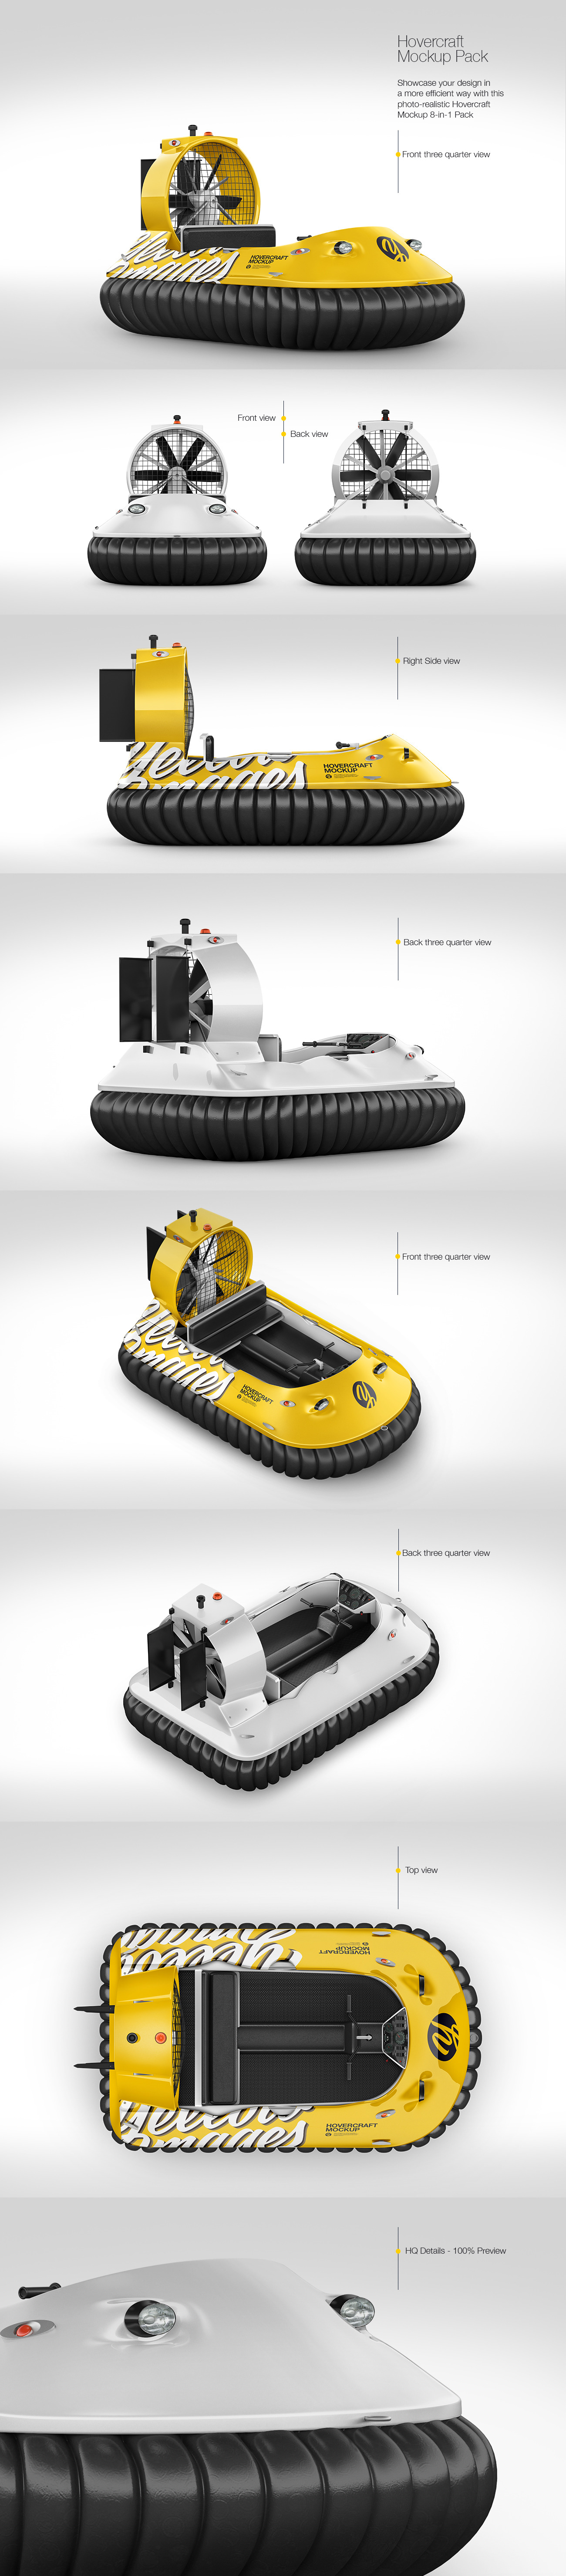 Hovercraft Mockup - Pack